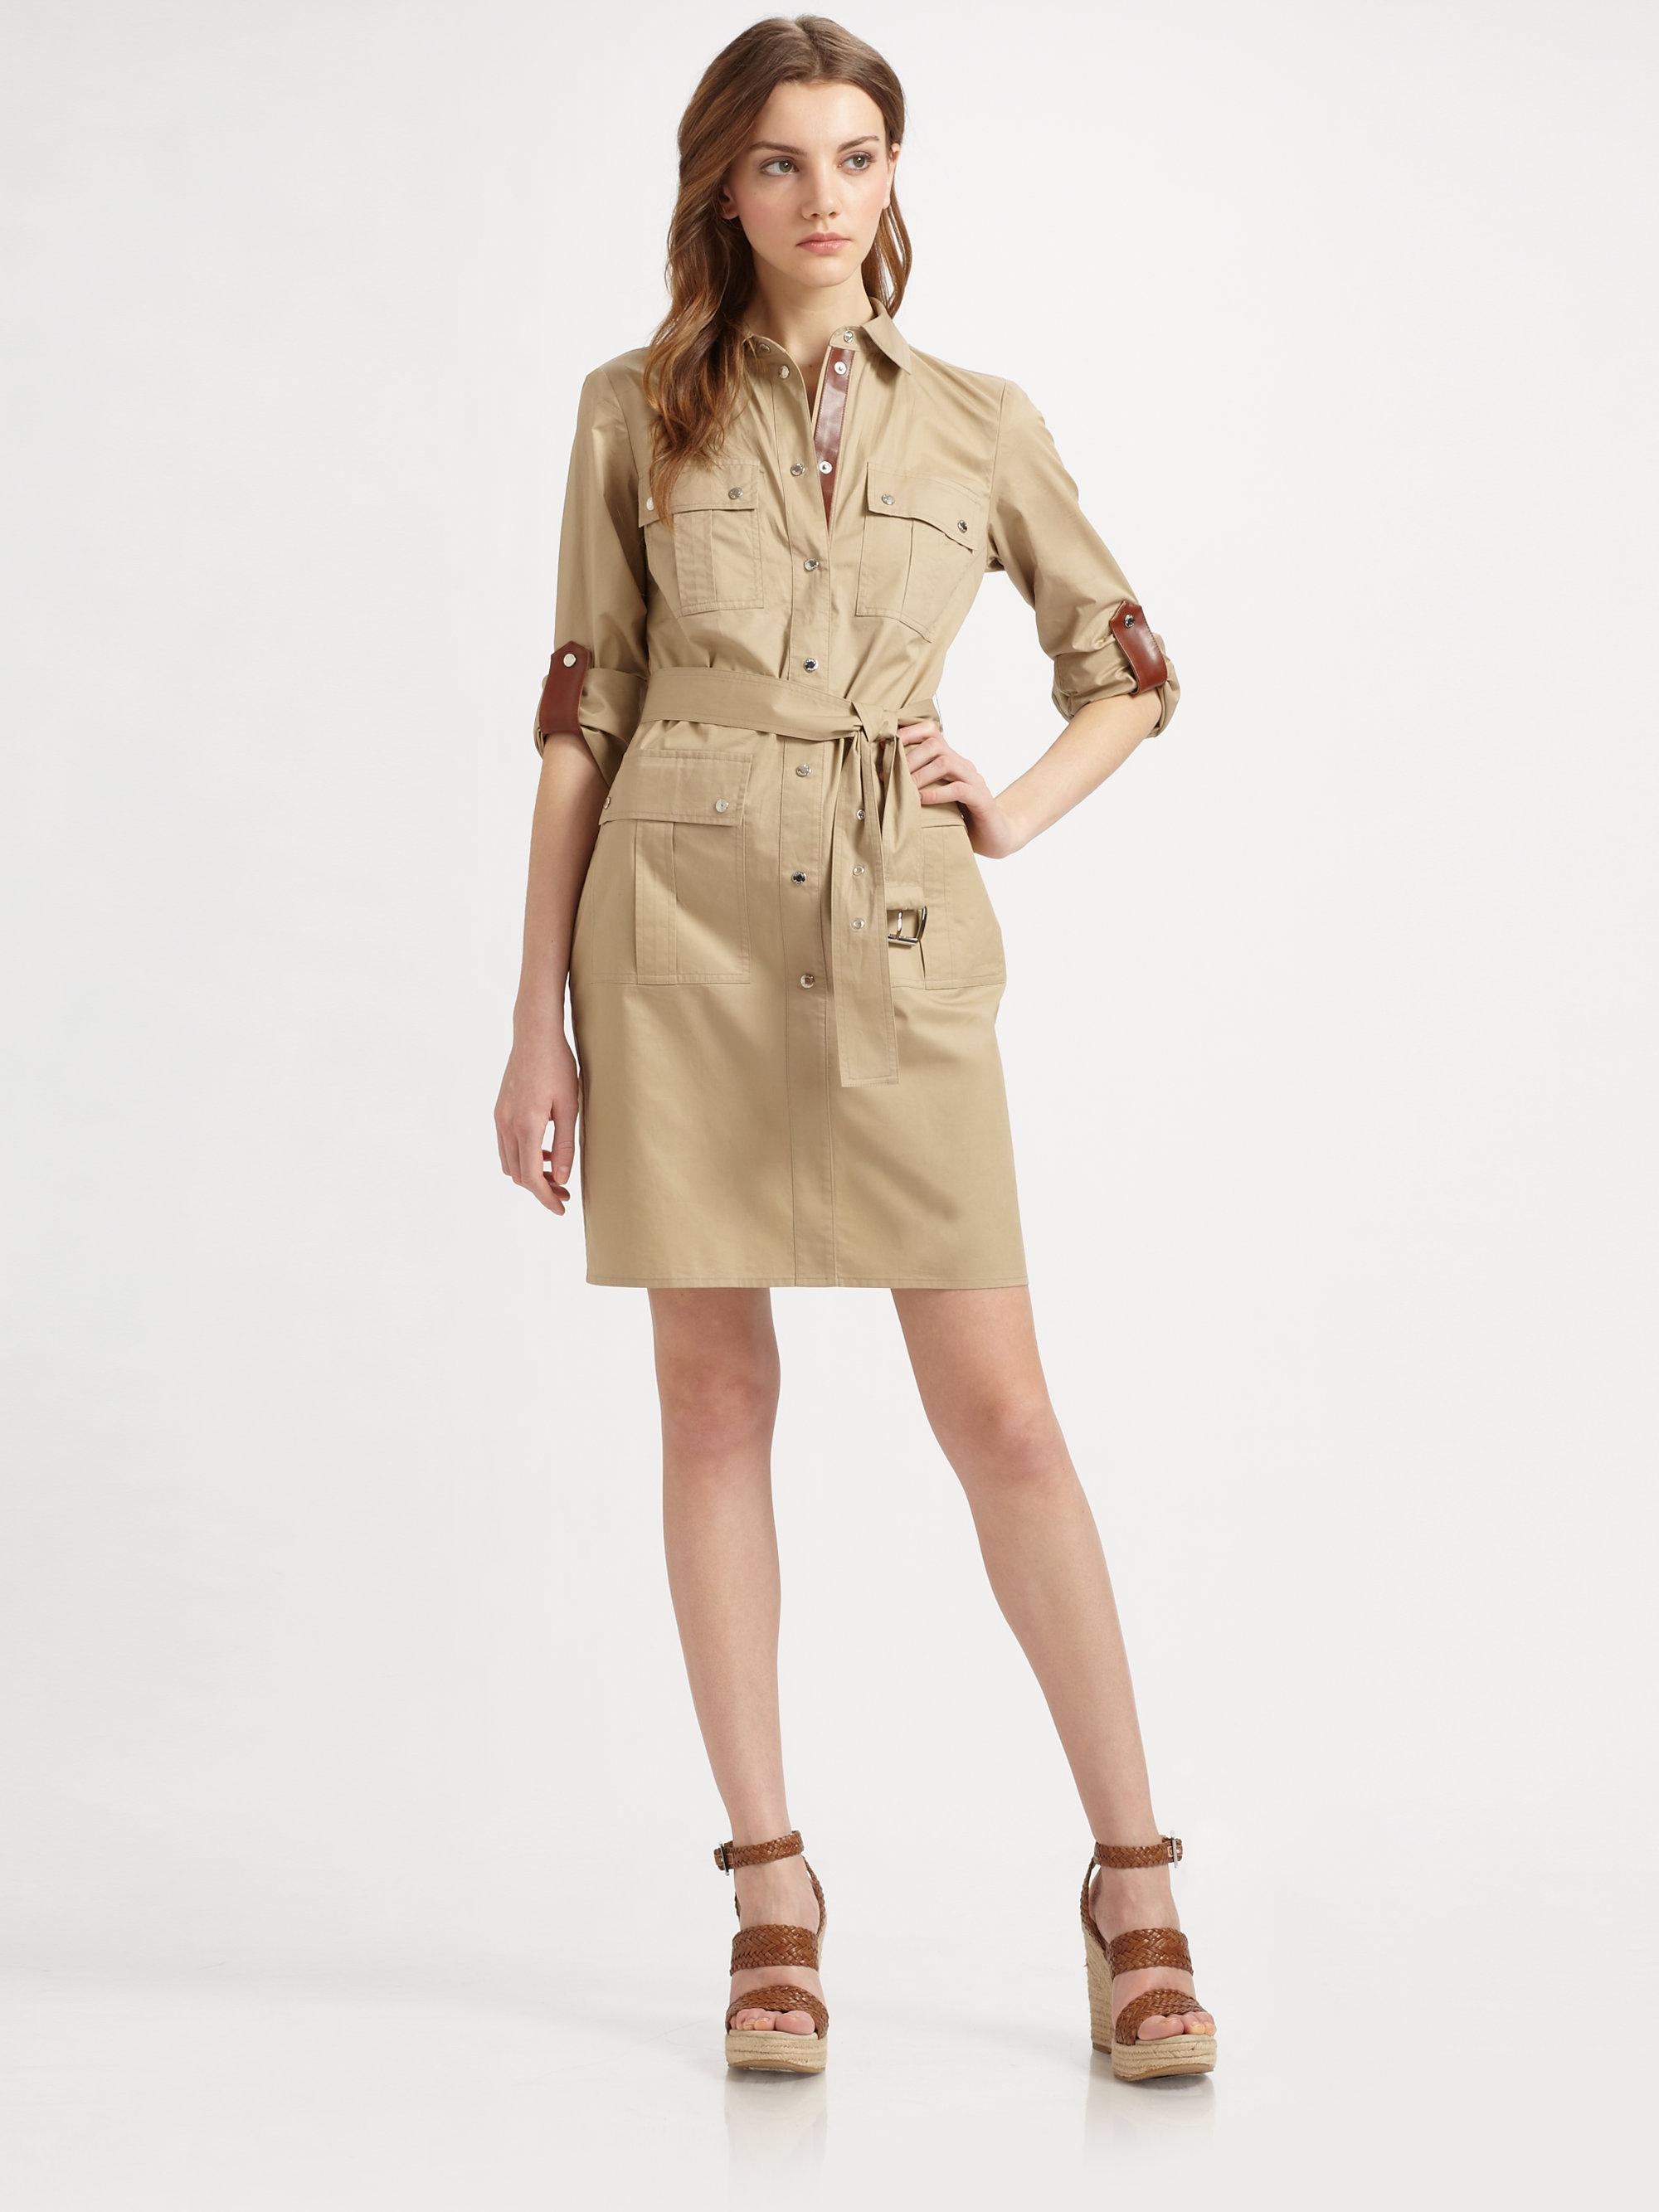 Women S Safari Clothing In Us